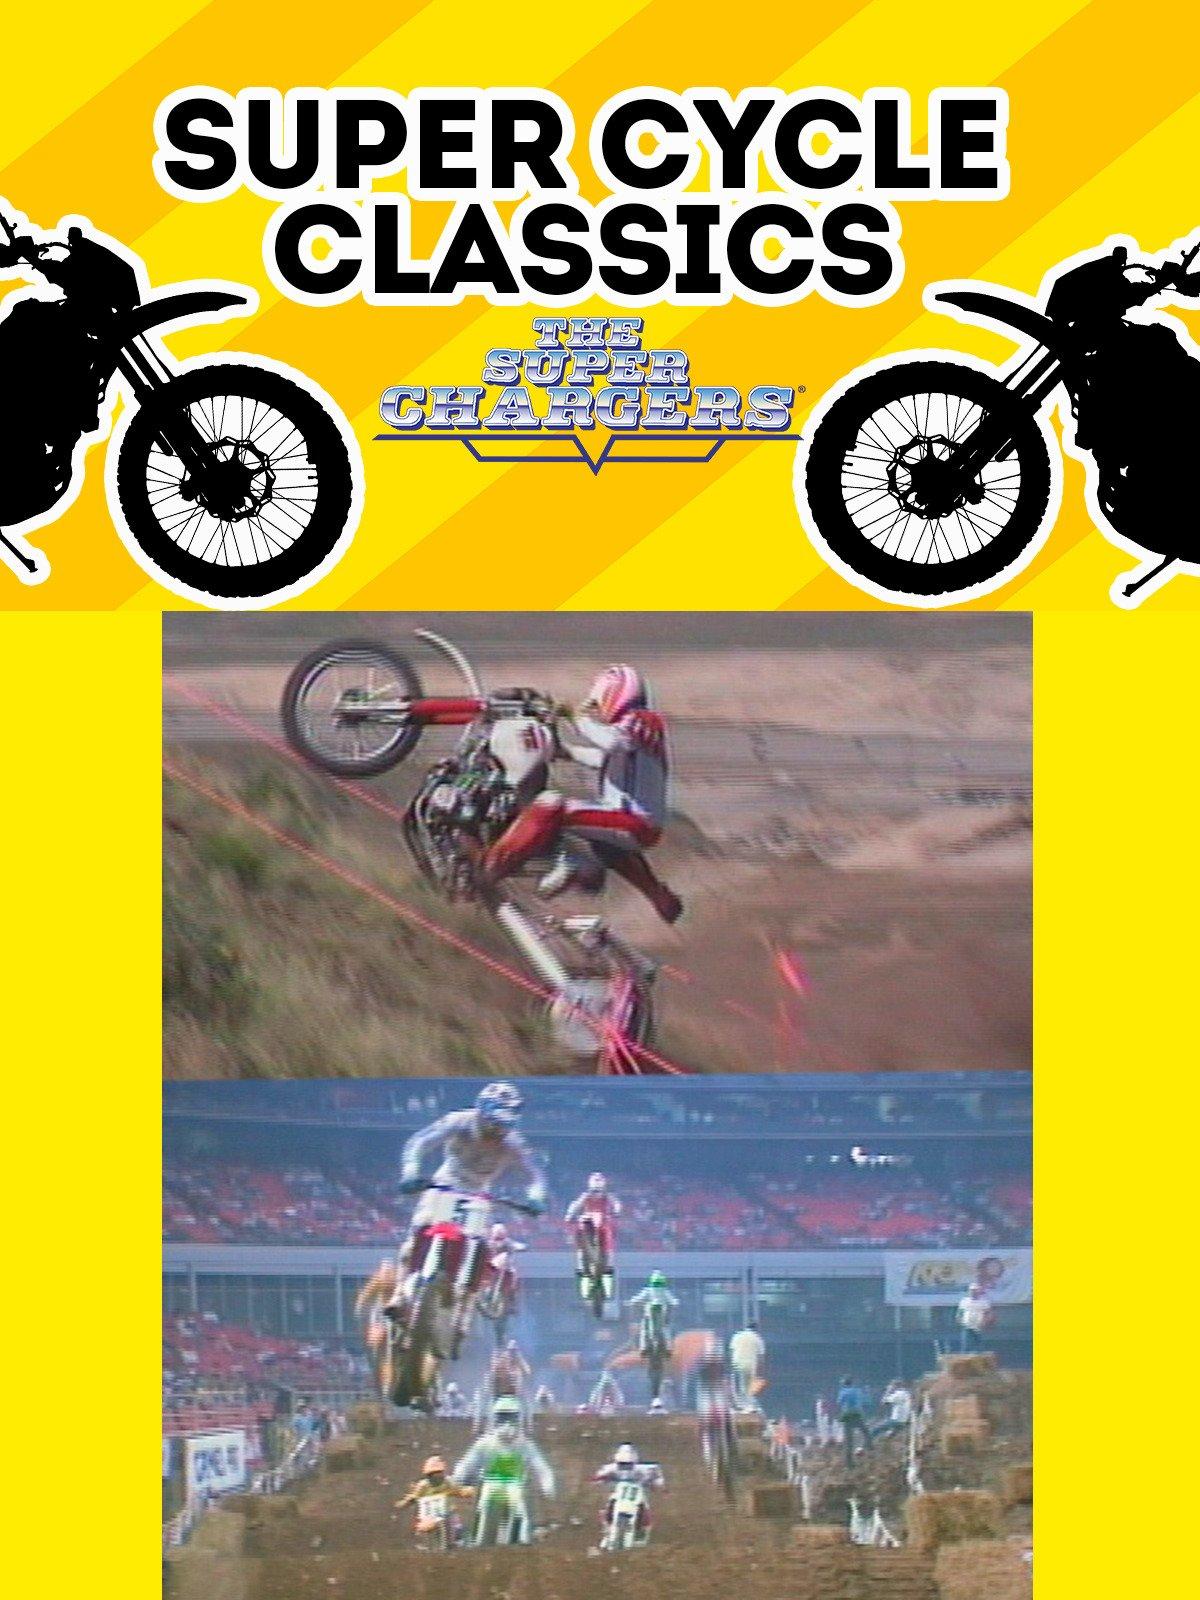 Super Cycle Classics on Amazon Prime Video UK